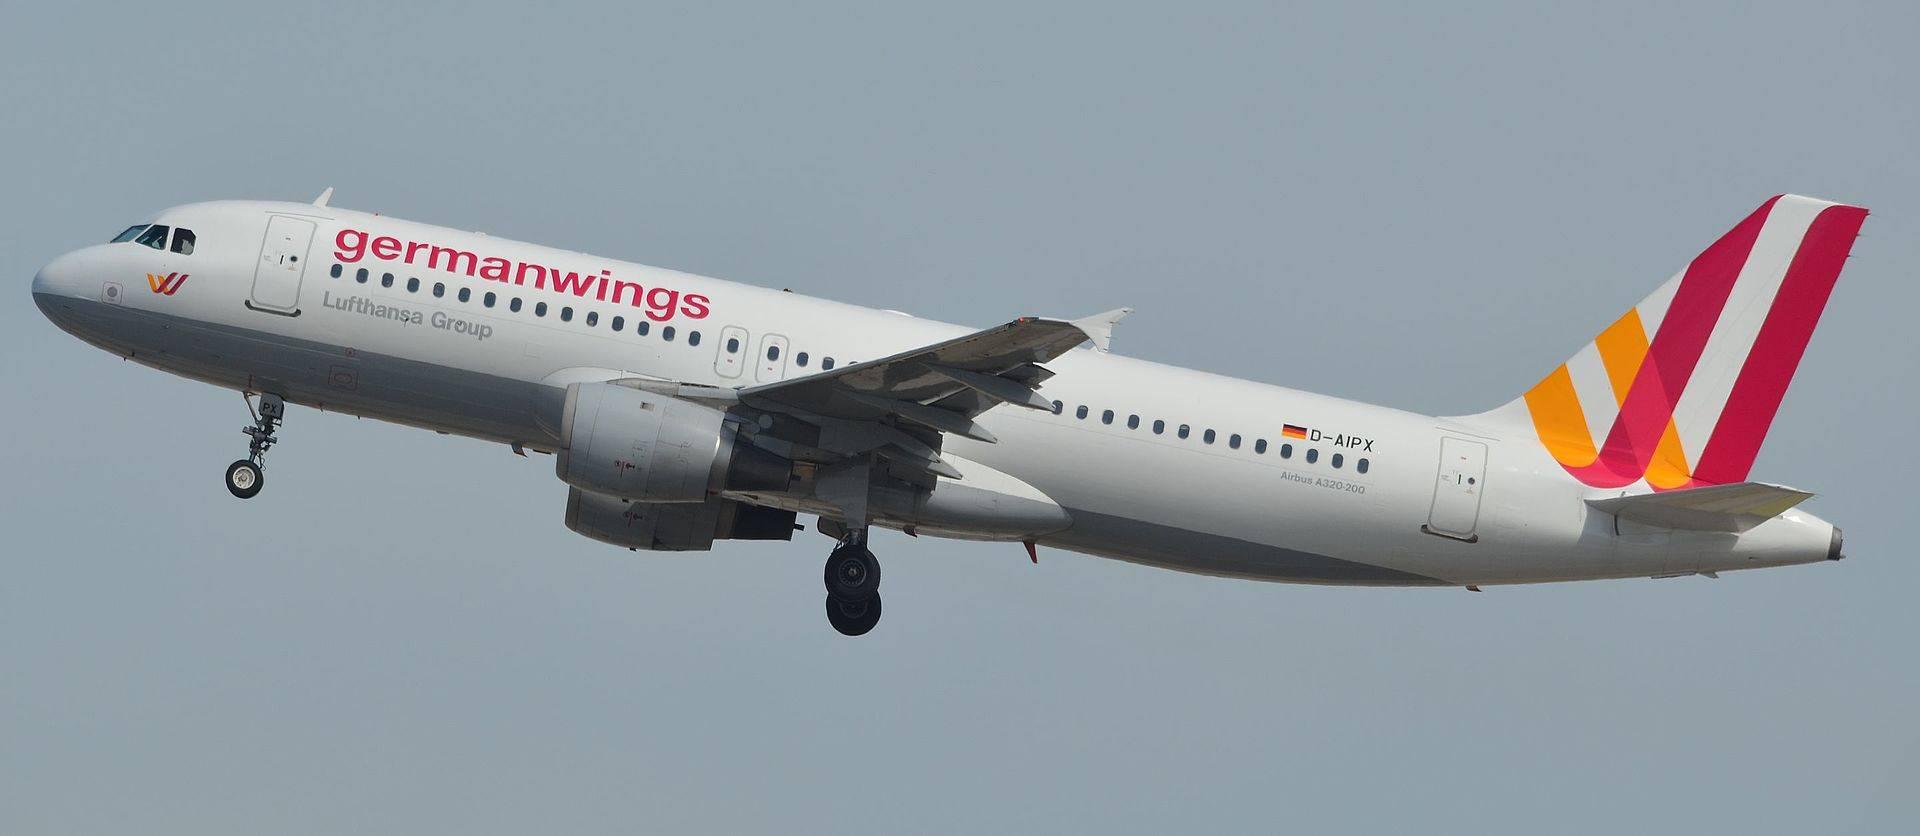 Разбившийся Airbus A320 за 10 месяцев до катастрофы